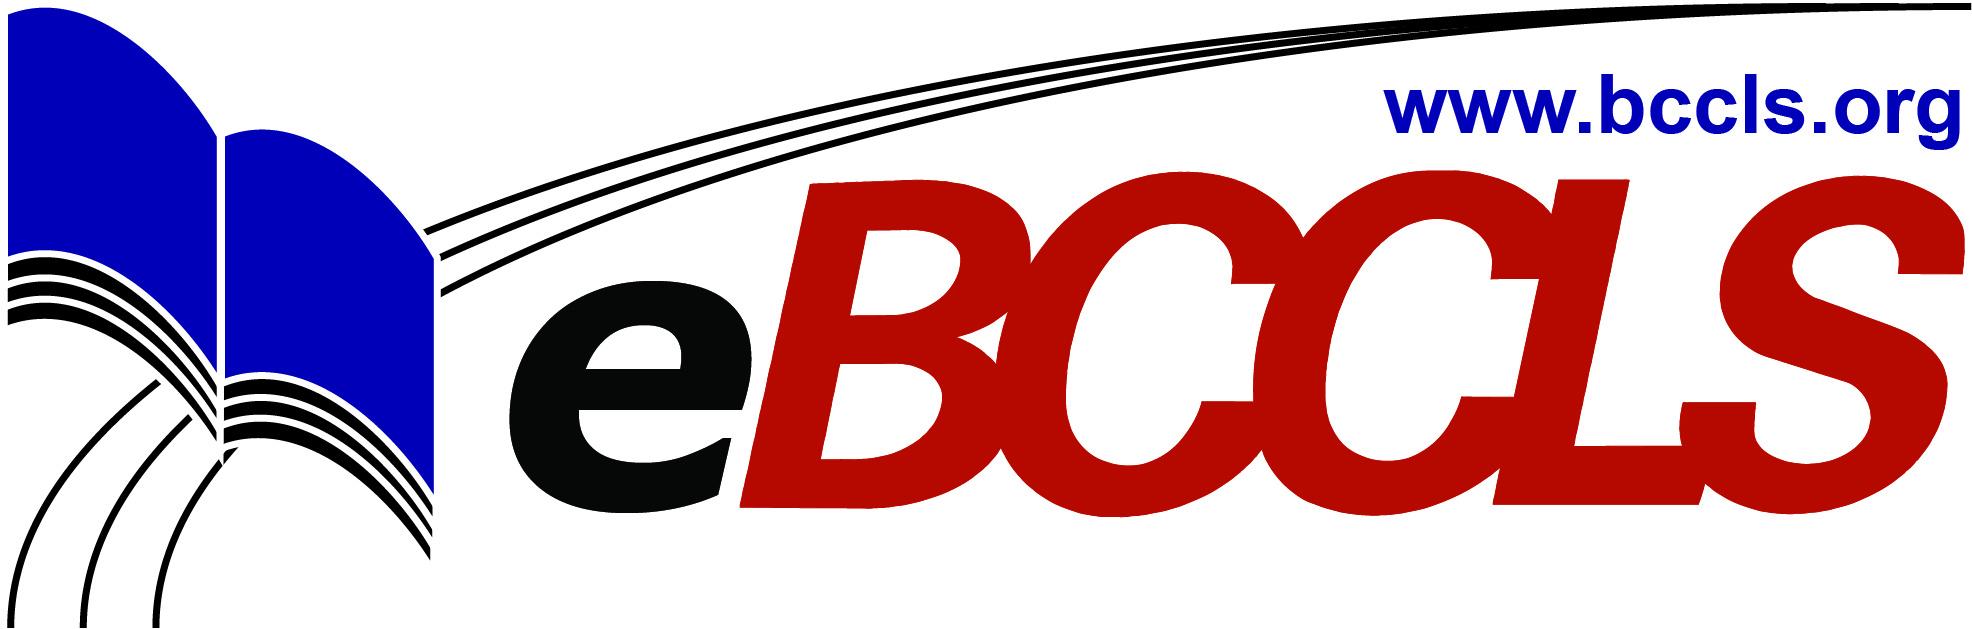 E-BCCLS